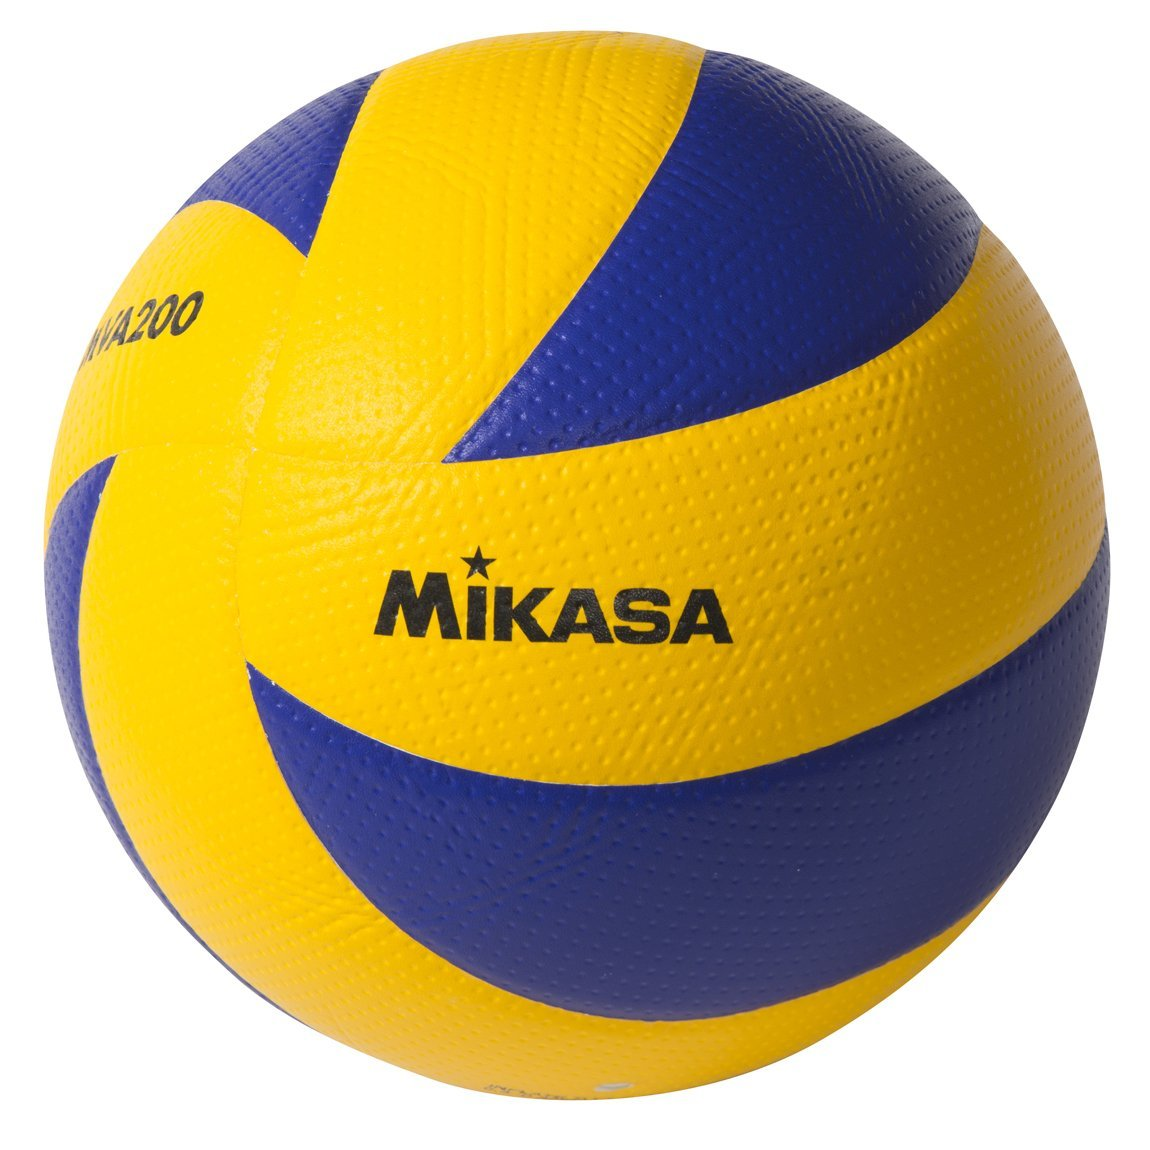 Mikasa MVA200  2008(Beijing), 2012(London), and 2016(Rio) indoor Olympic Games Ball (Blue/Yellow) by Mikasa Sports